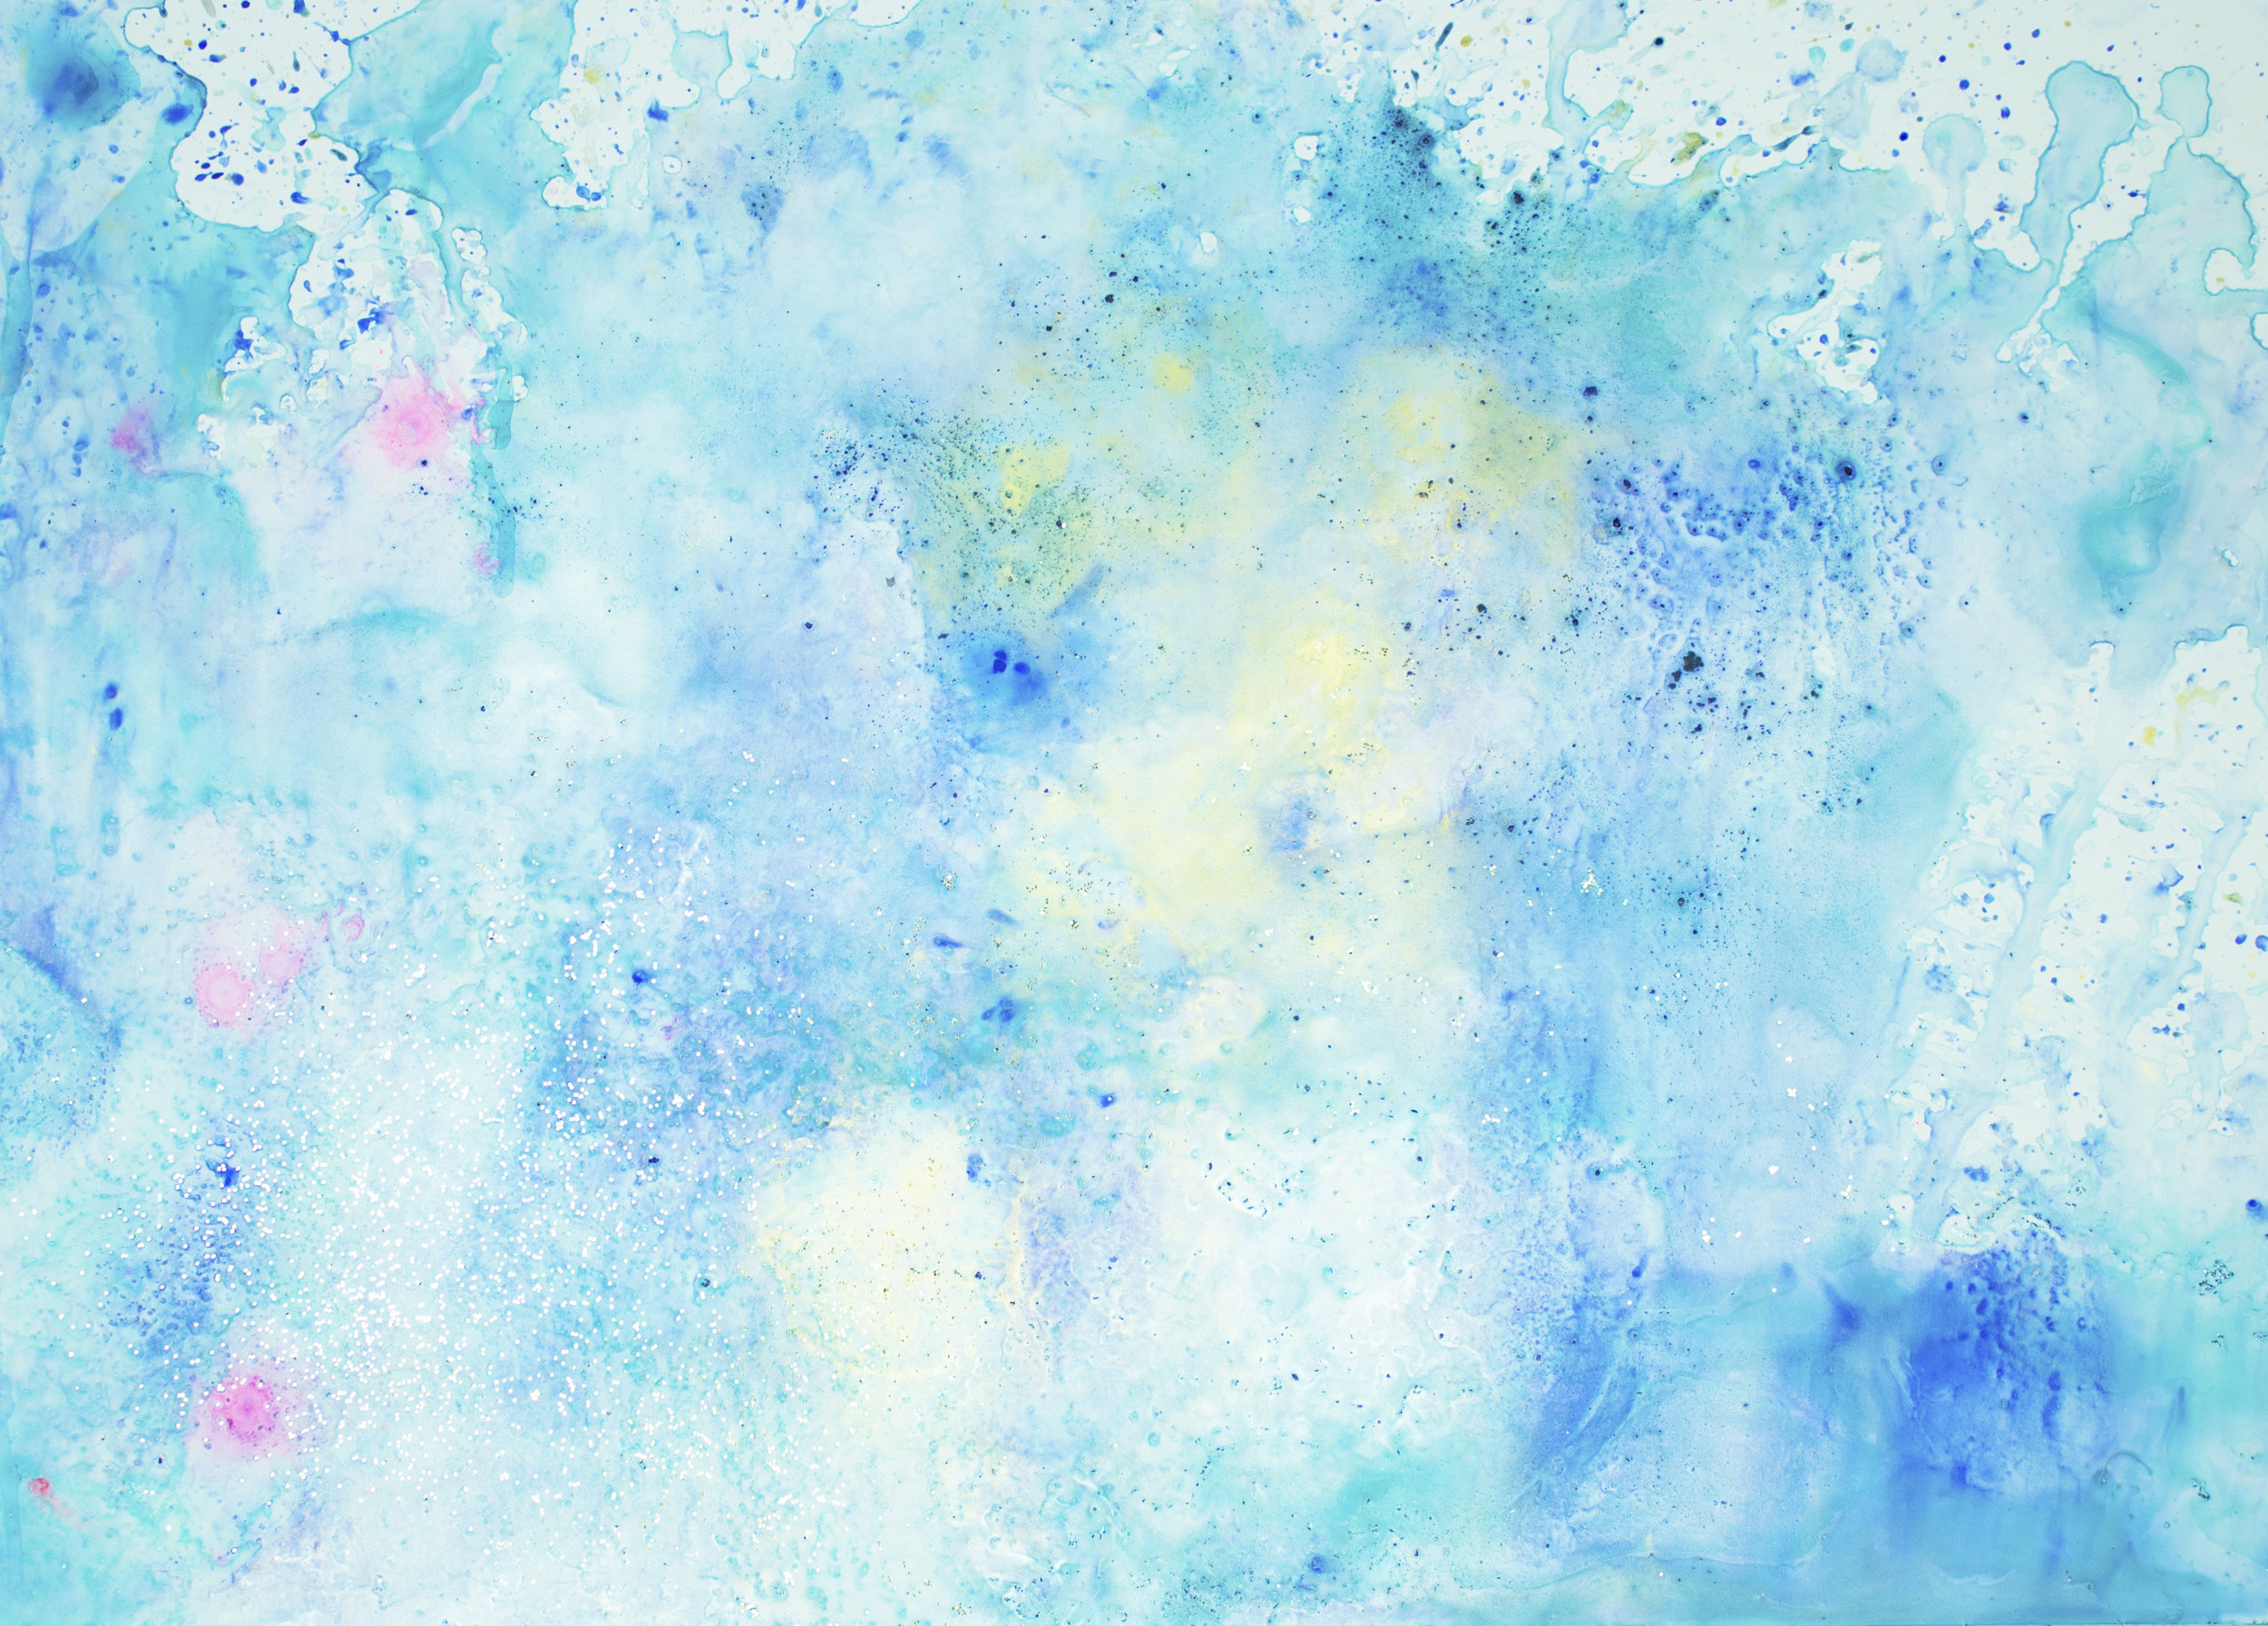 'Blush skies, NO. 7', 42 x 59,5 cm, acrylic paint on Steinpaperbase, Kerstin Pressler, www.kerstinpressler.com